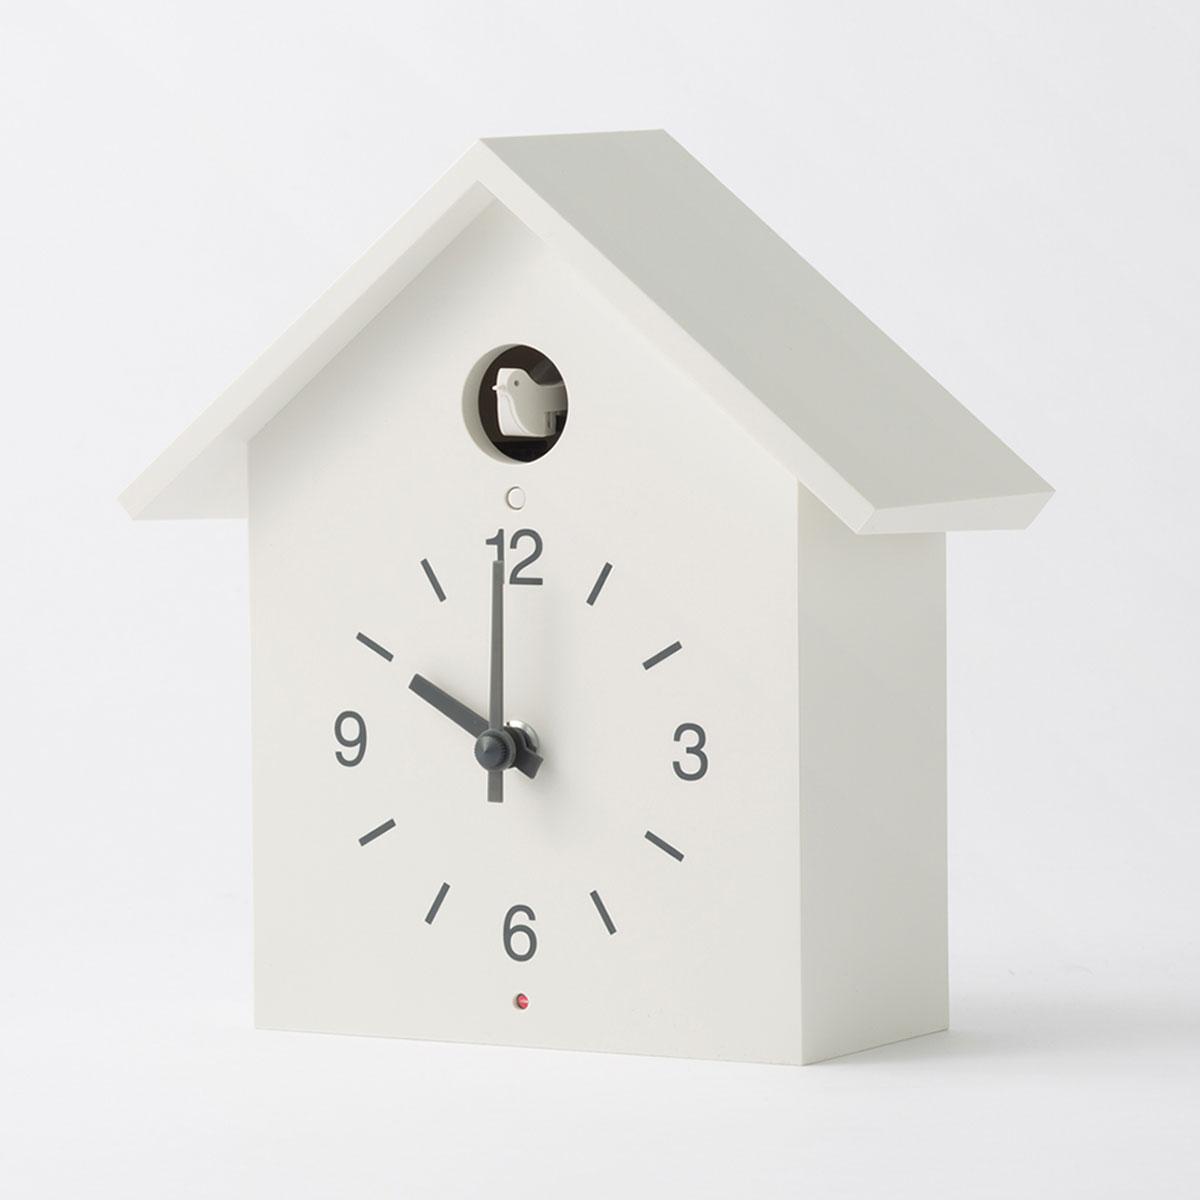 無印良品 公式 大 鳩時計 直送商品 激安セール